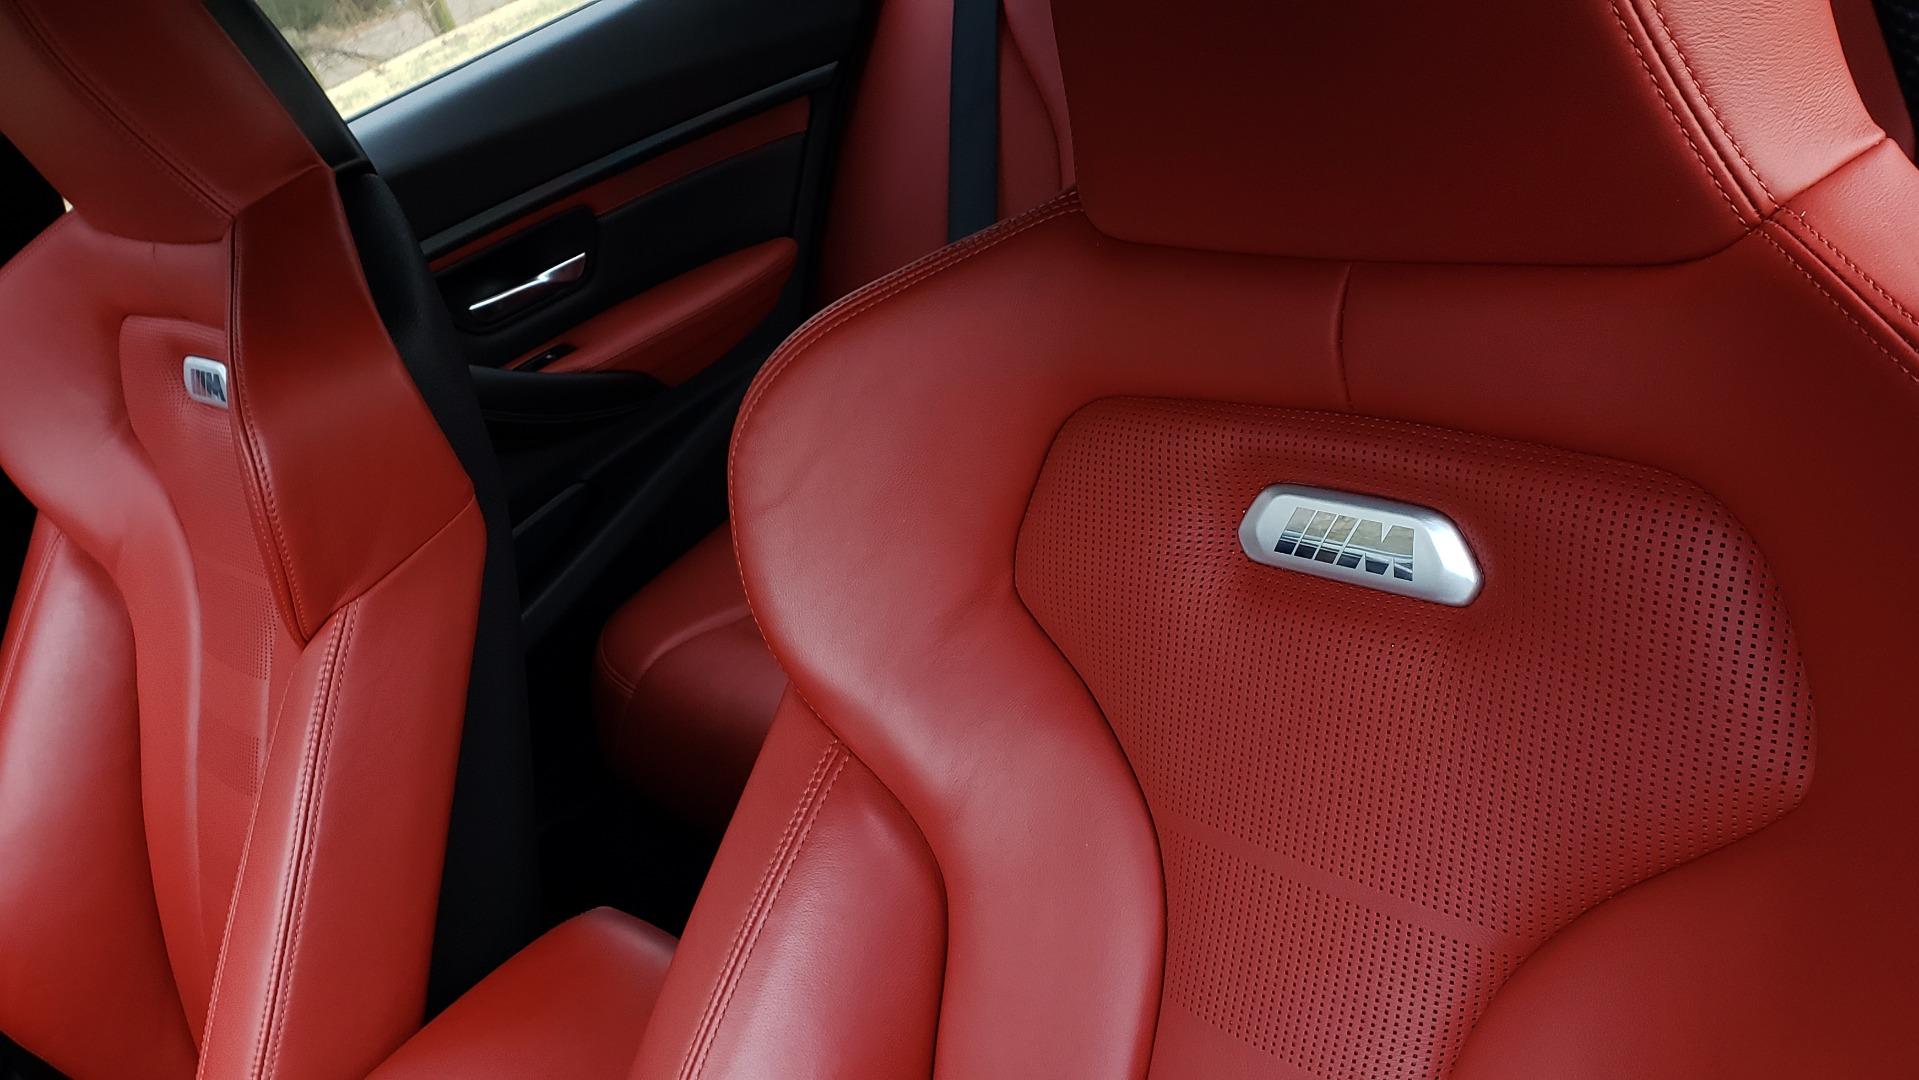 Used 2015 BMW M3 EXECUTIVE PKG / NAV / CAMERA / HUD / CARBON FIBER ROOF for sale Sold at Formula Imports in Charlotte NC 28227 53